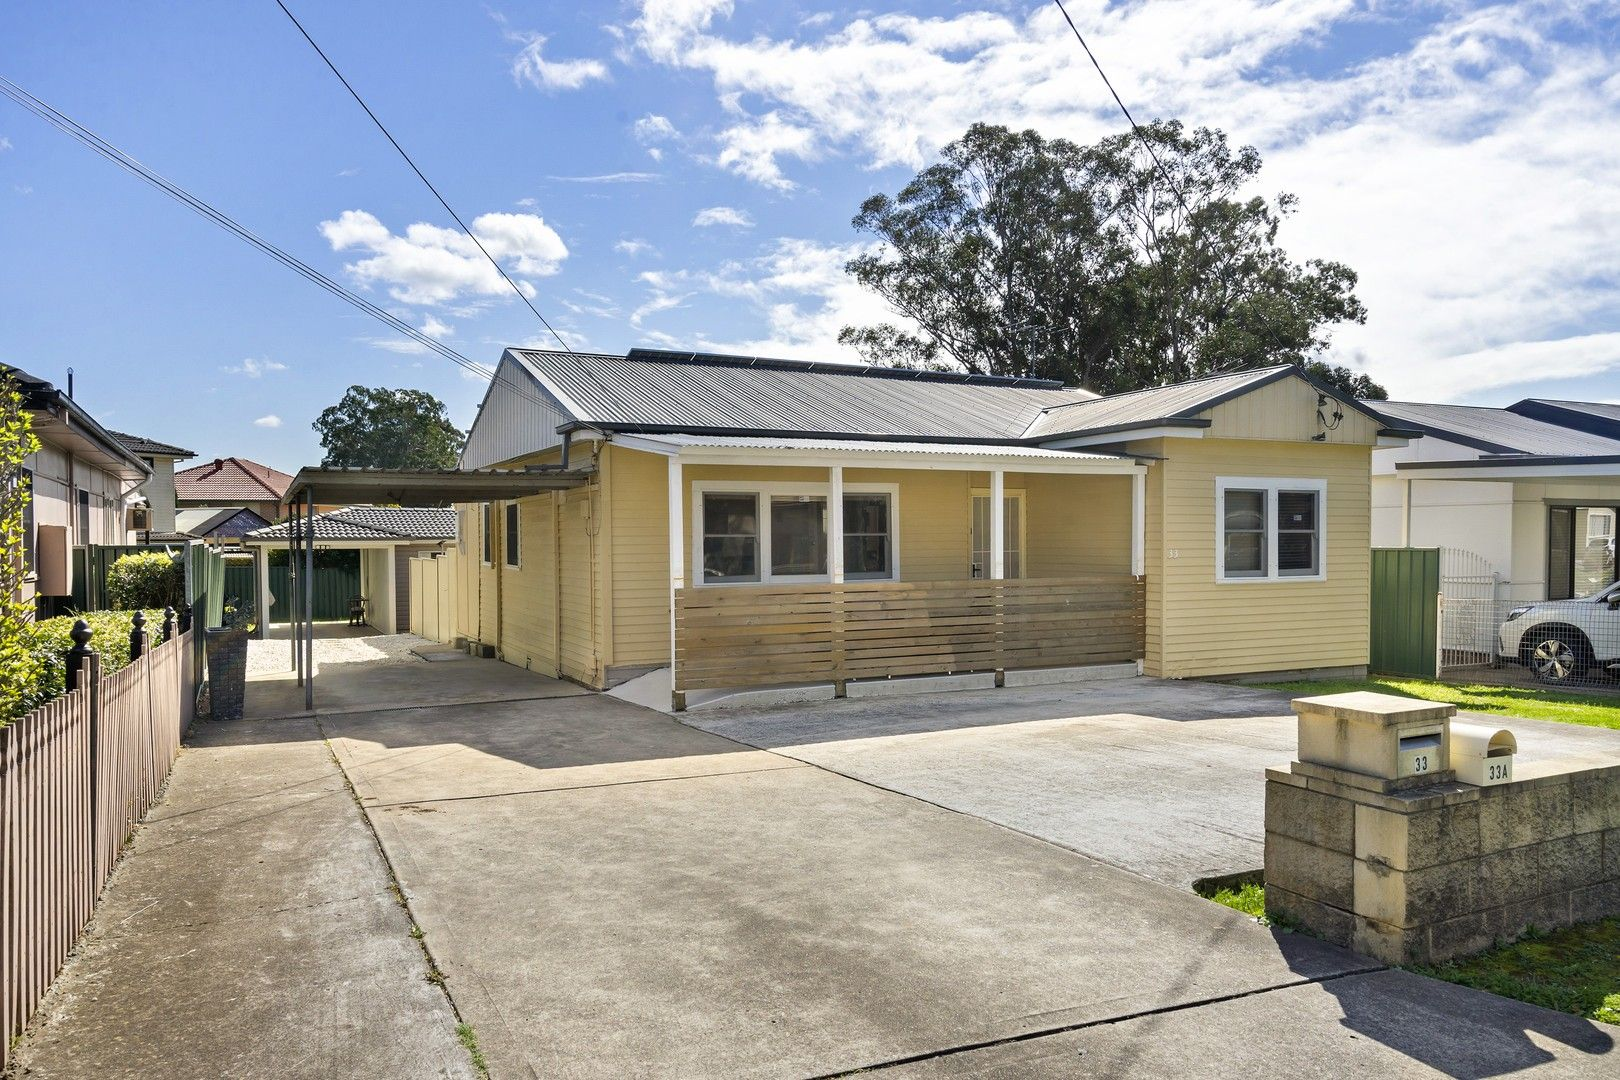 33 & 33a Killarney Avenue, Blacktown NSW 2148, Image 0